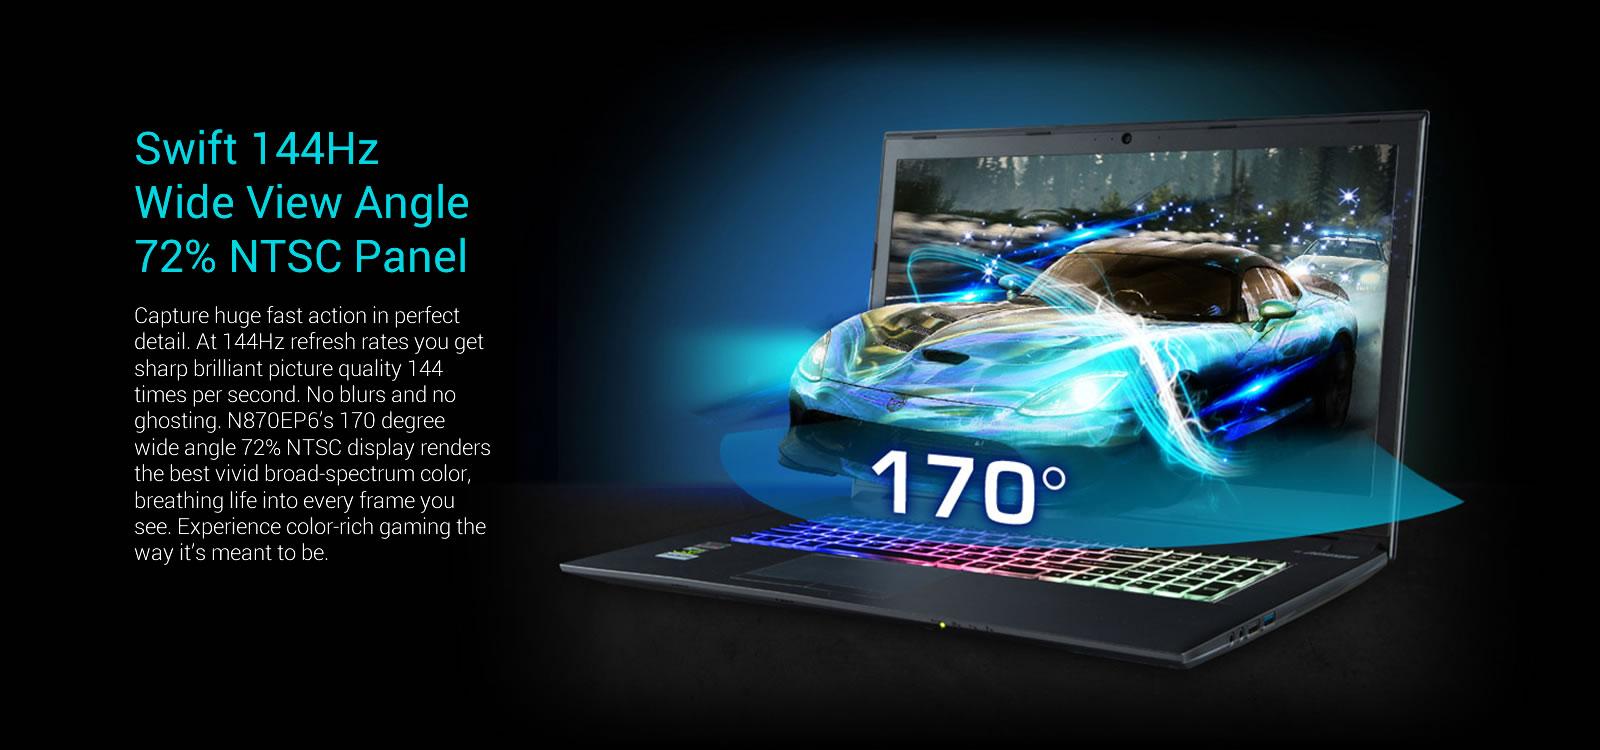 Clevo N870ep6 173 Core I7 Gtx 1060 Gaming Laptop Avadirect Asus Mg279q Monitor 27ampquot 2k Wqhd 2560 X 1440 Ips Up To 144hz Freesync Cpu